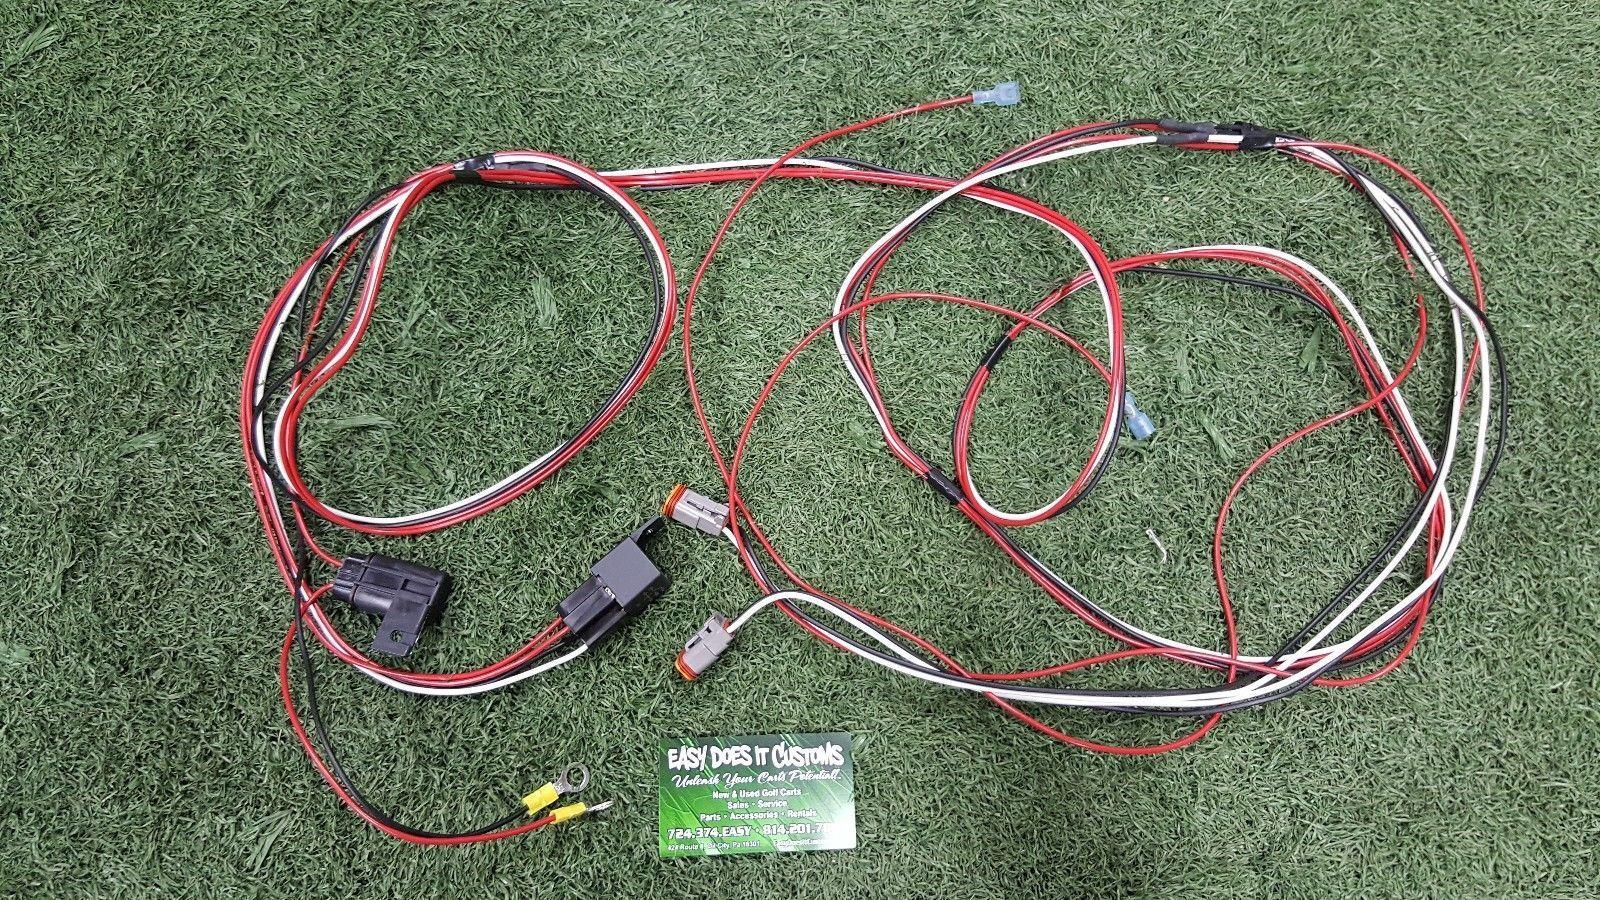 medium resolution of make sure the led light bars on your club car ezgo or yamaha golf